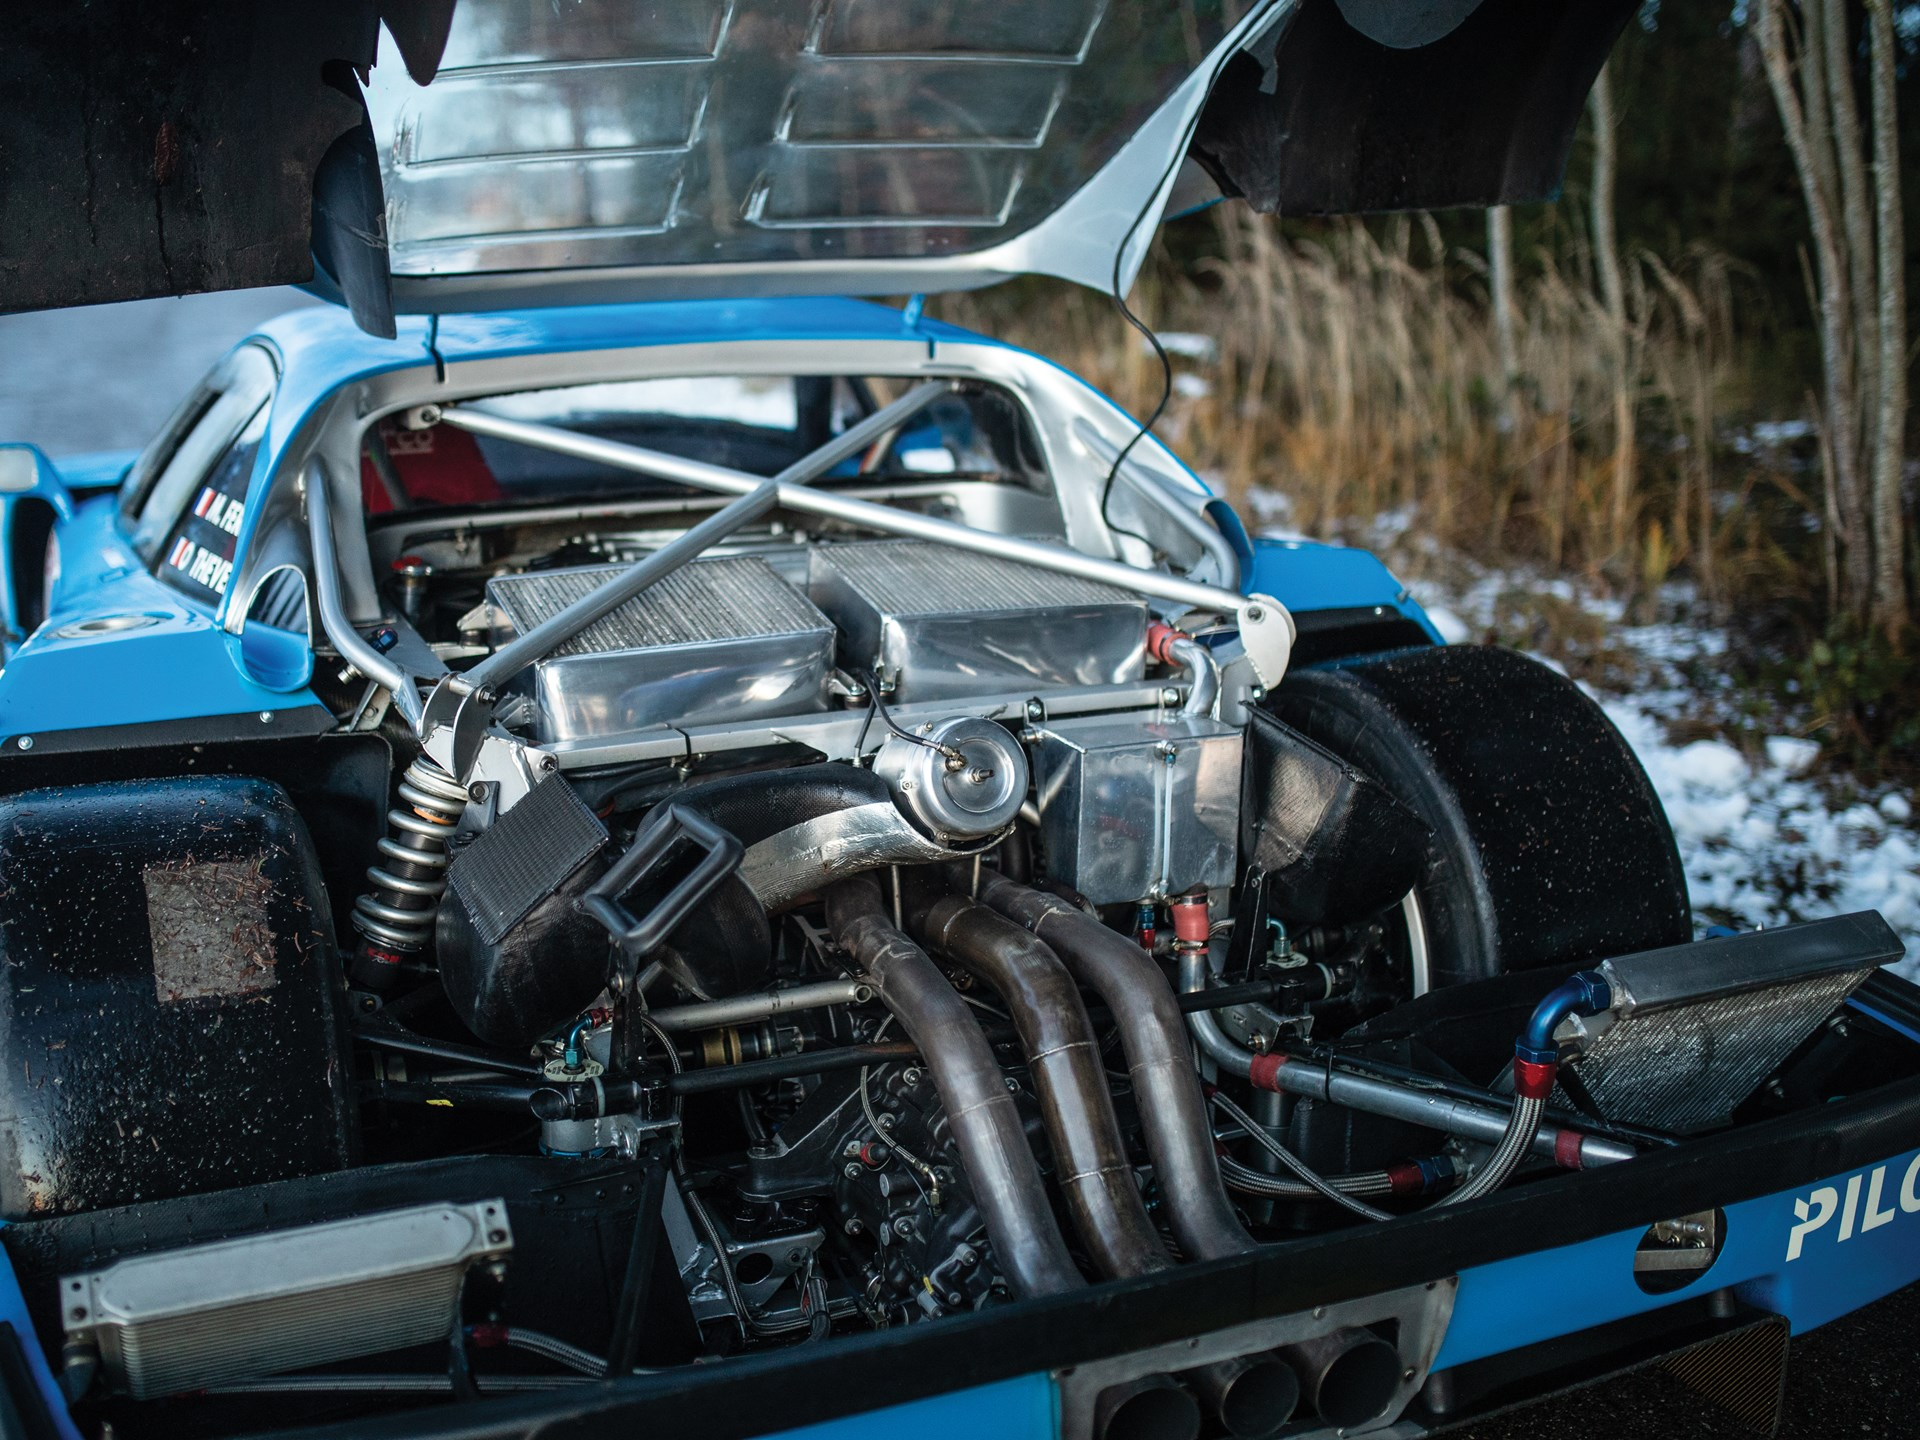 1987 Ferrari F40 LM rear engine hood up